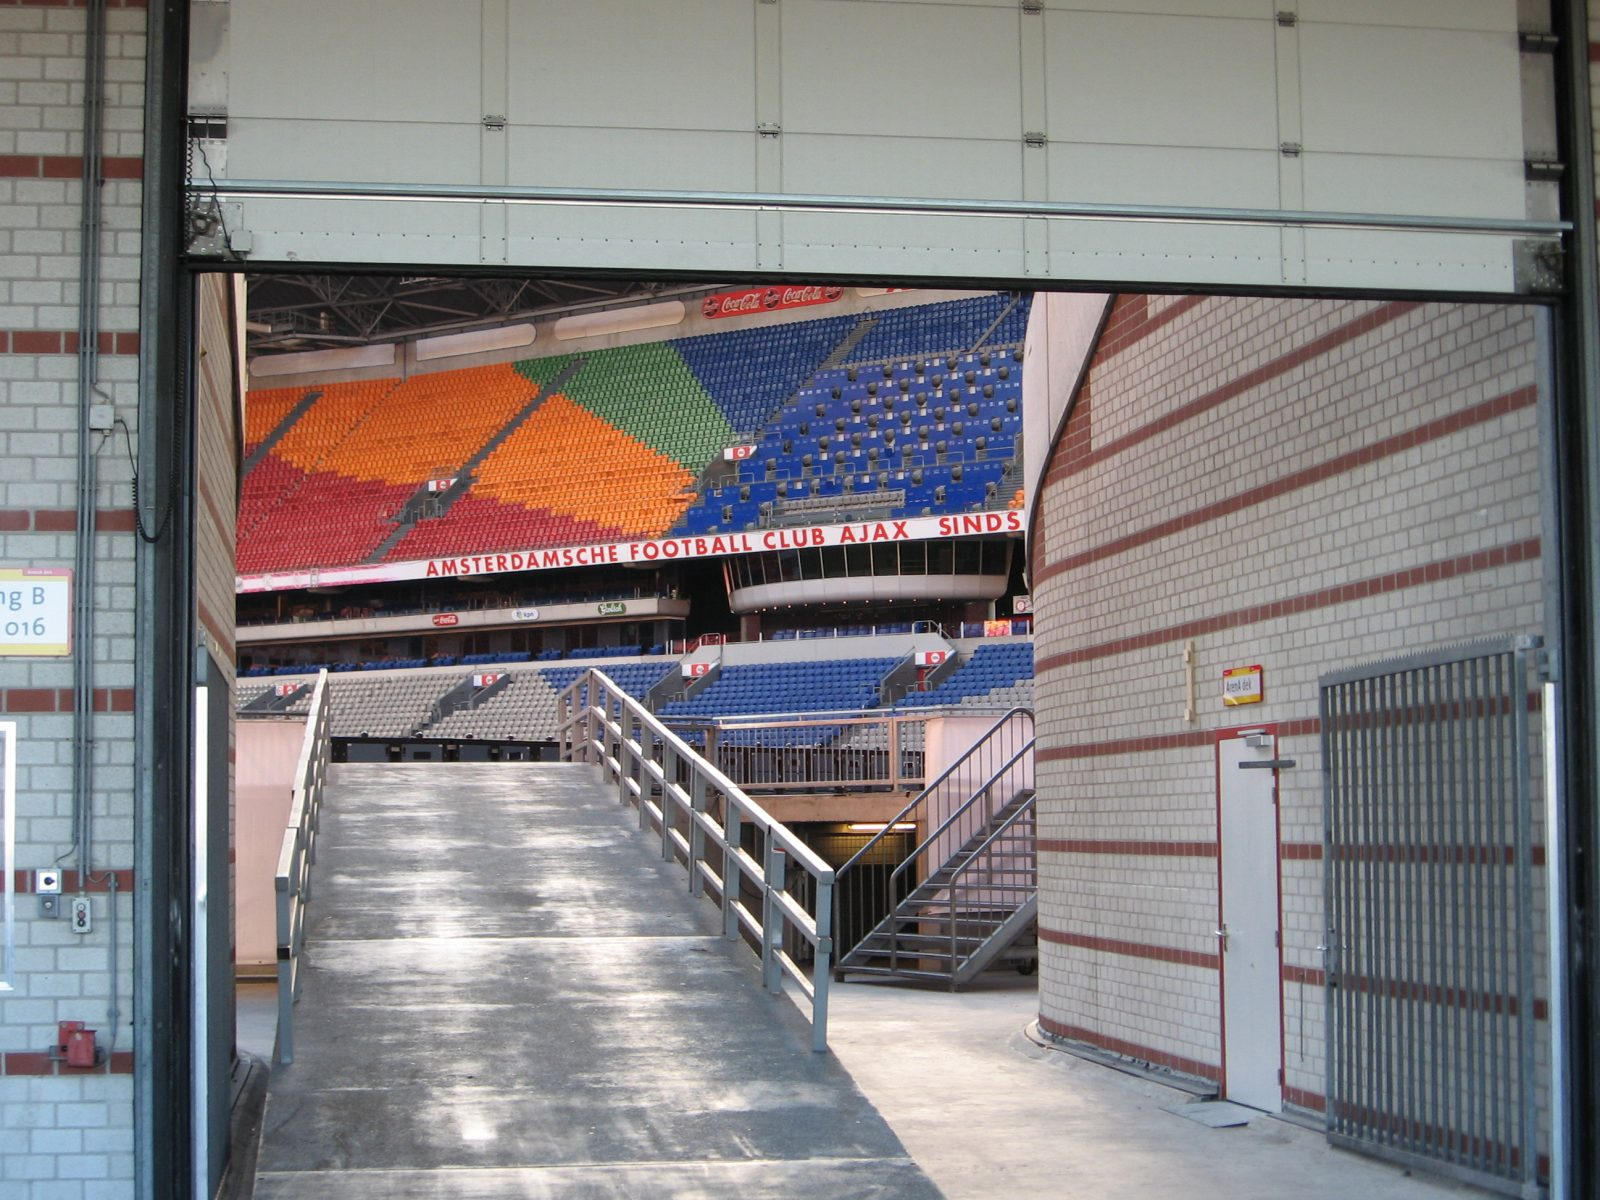 Afc Ajax Amsterdam Arena Fire Retardant Doors Protec